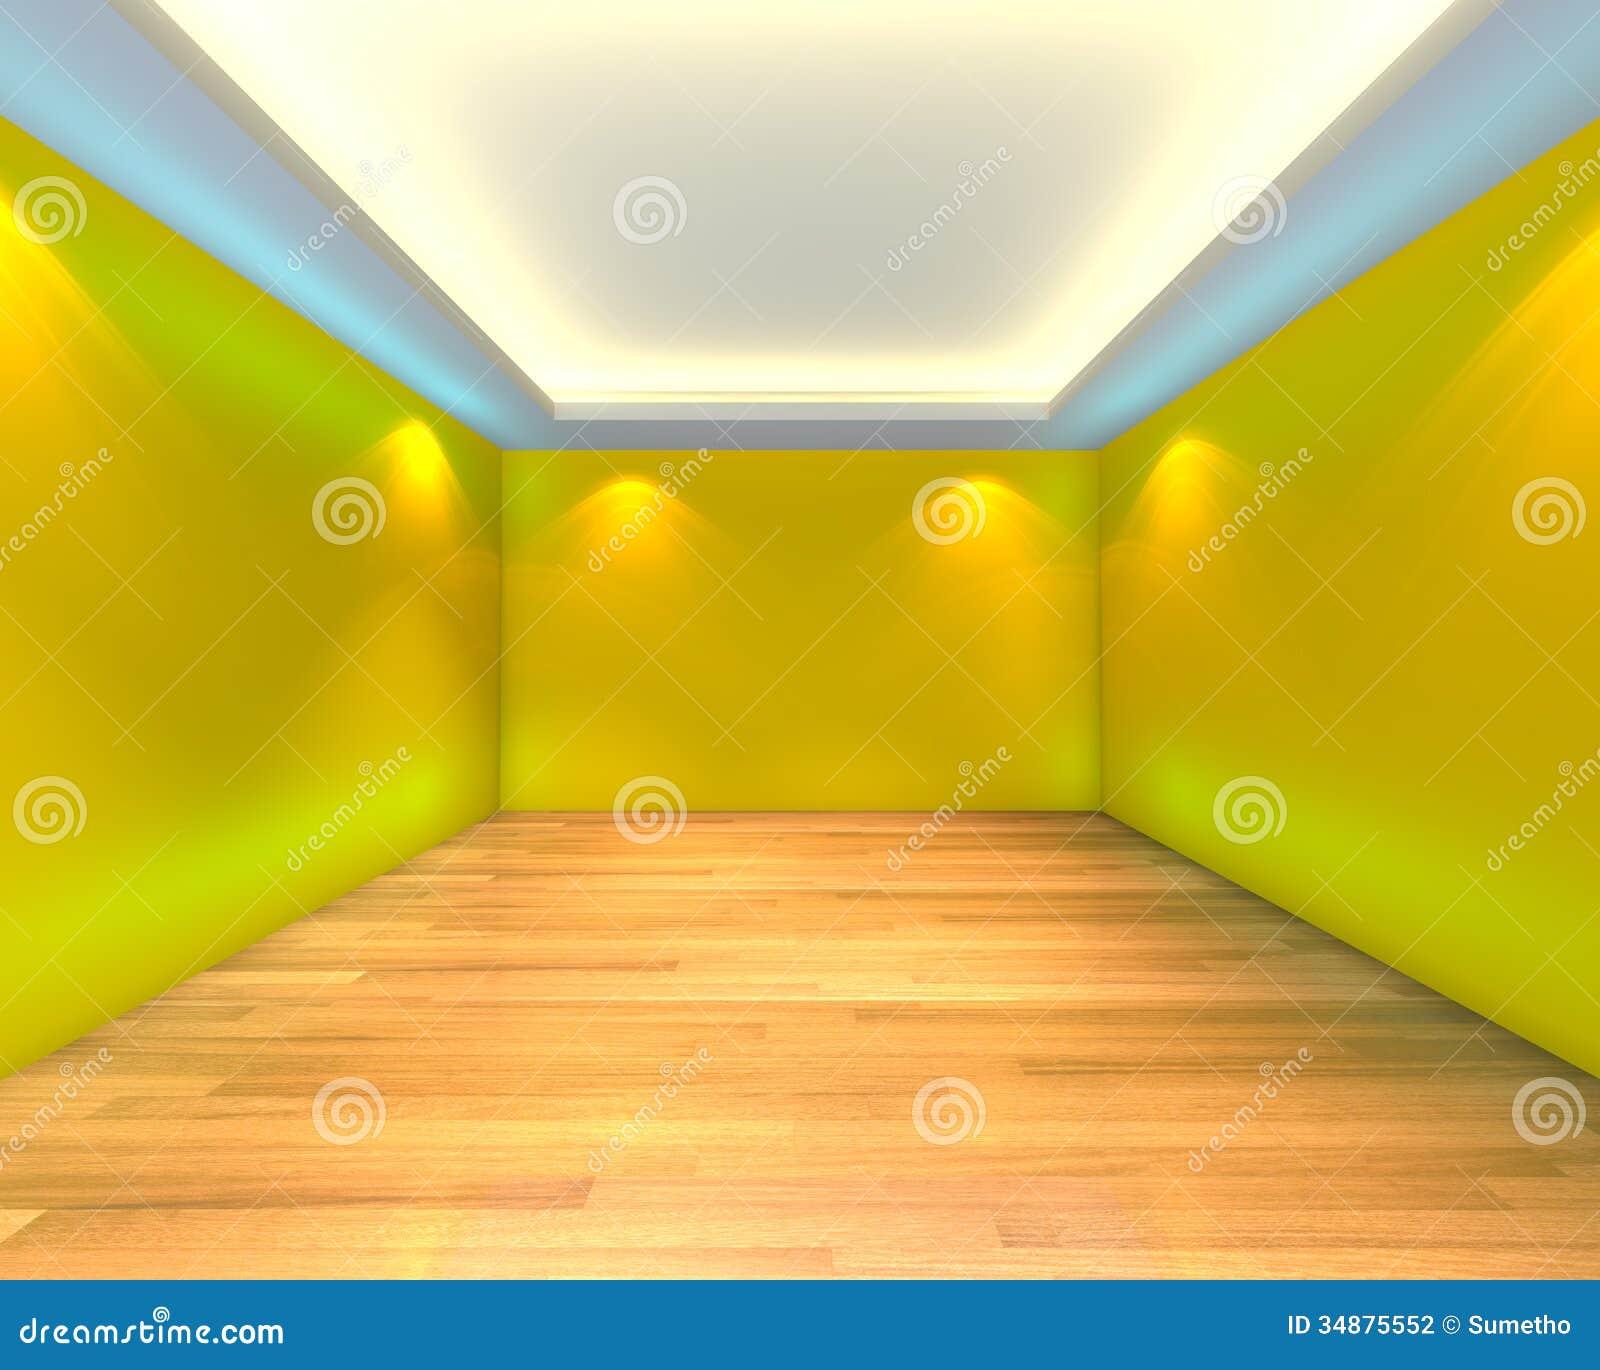 Empty room yellow wall stock illustration. Illustration of home ...